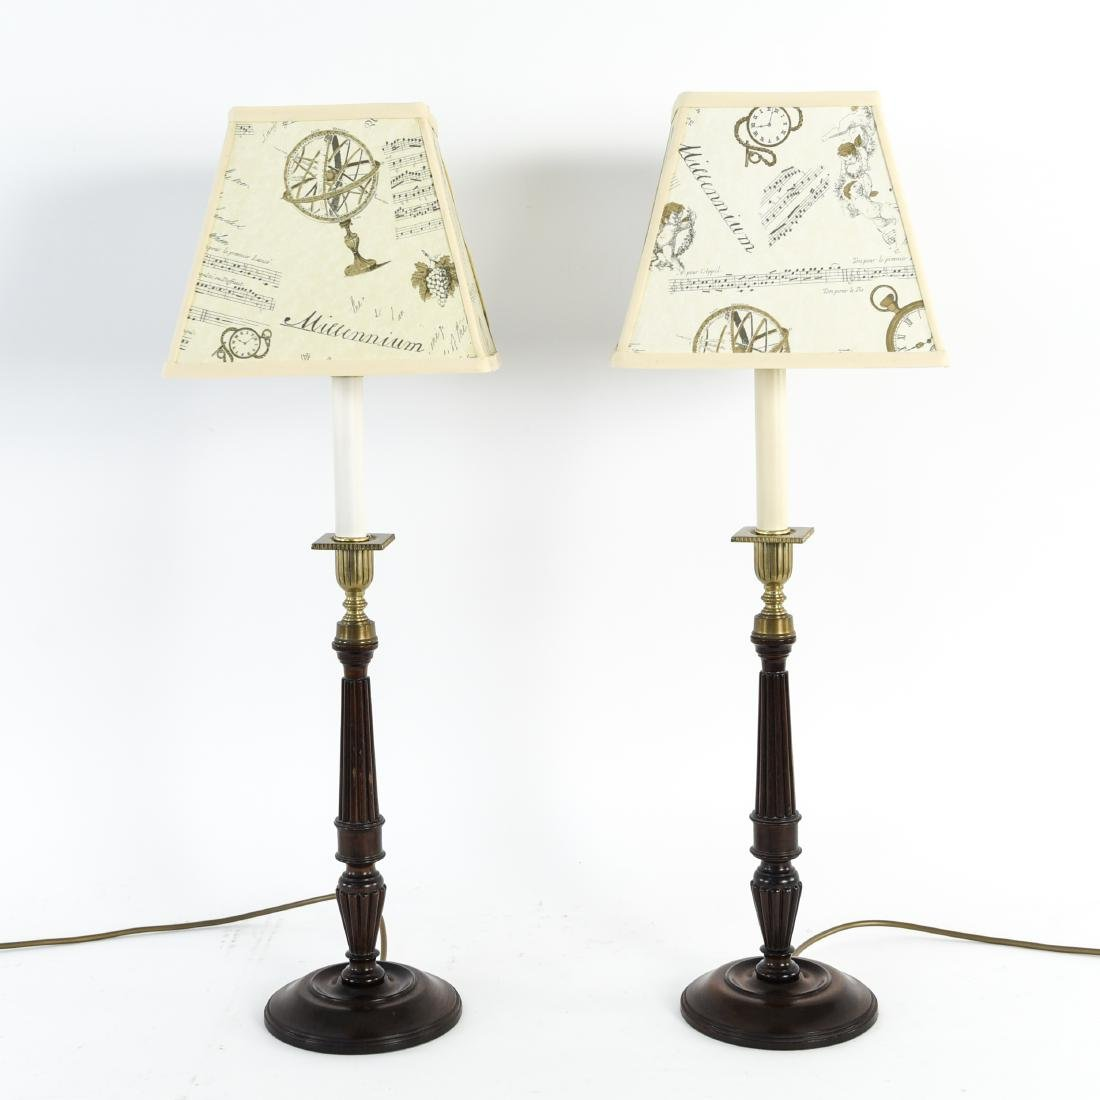 PAIR OF WOODEN COLUMN LAMPS